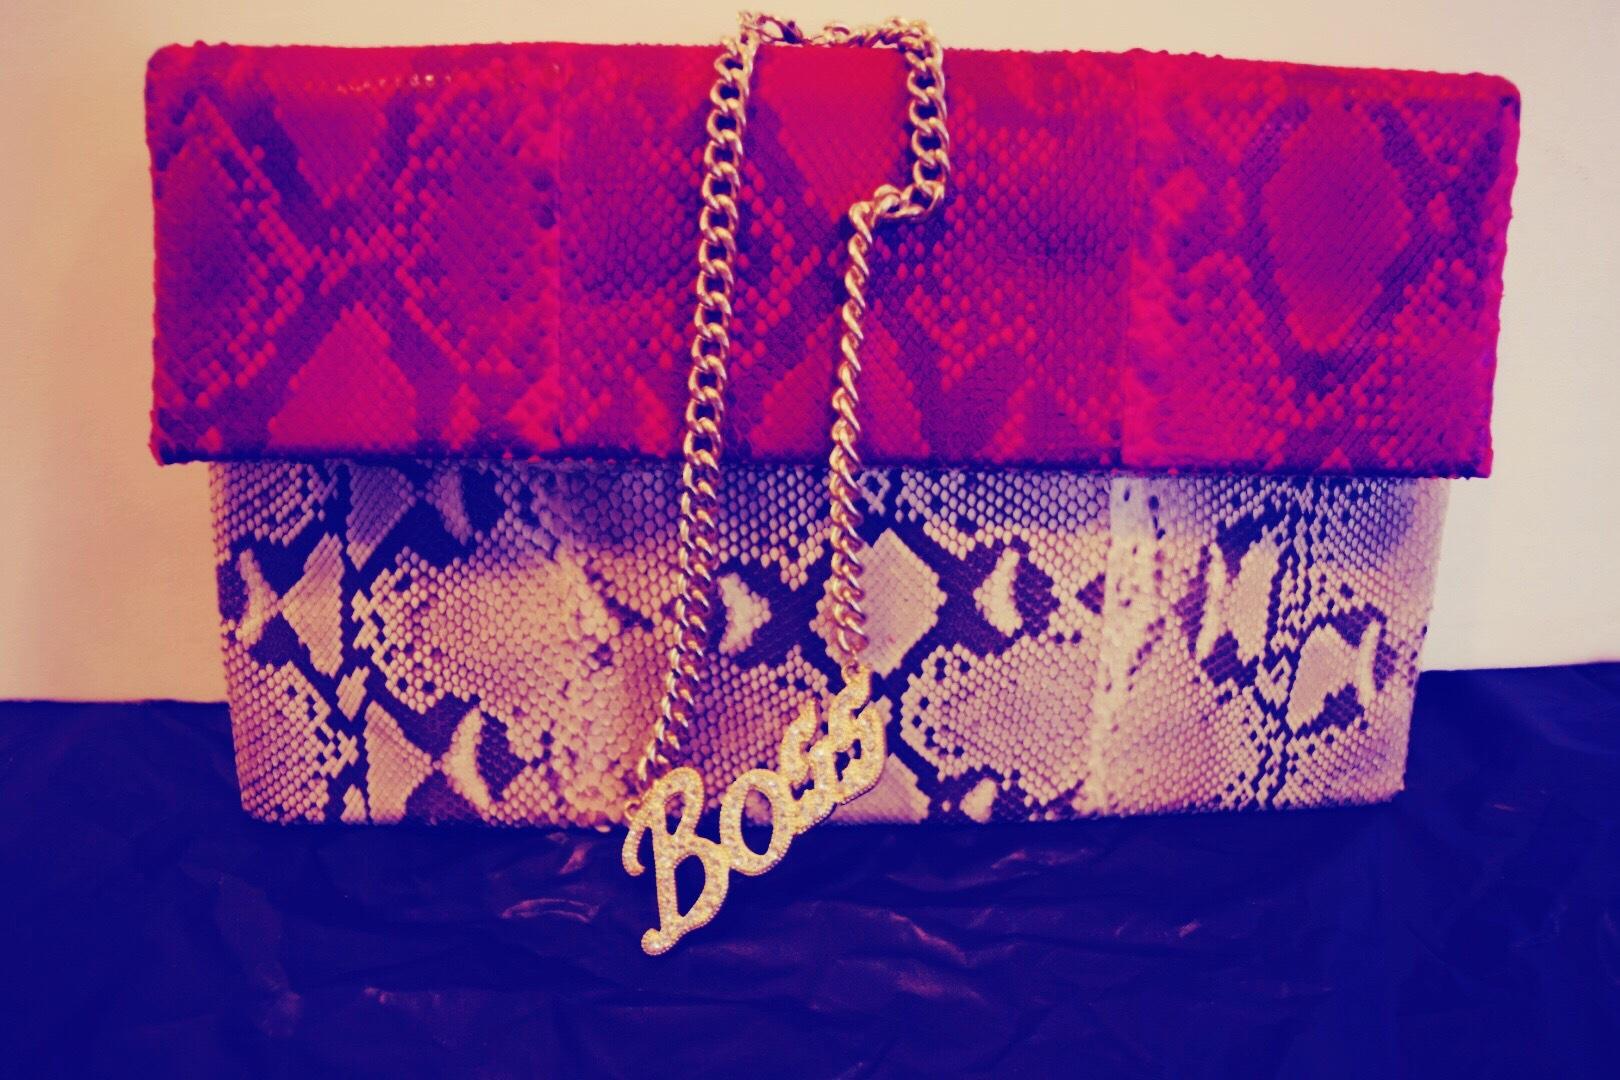 A Divas bag by Bellavxyn